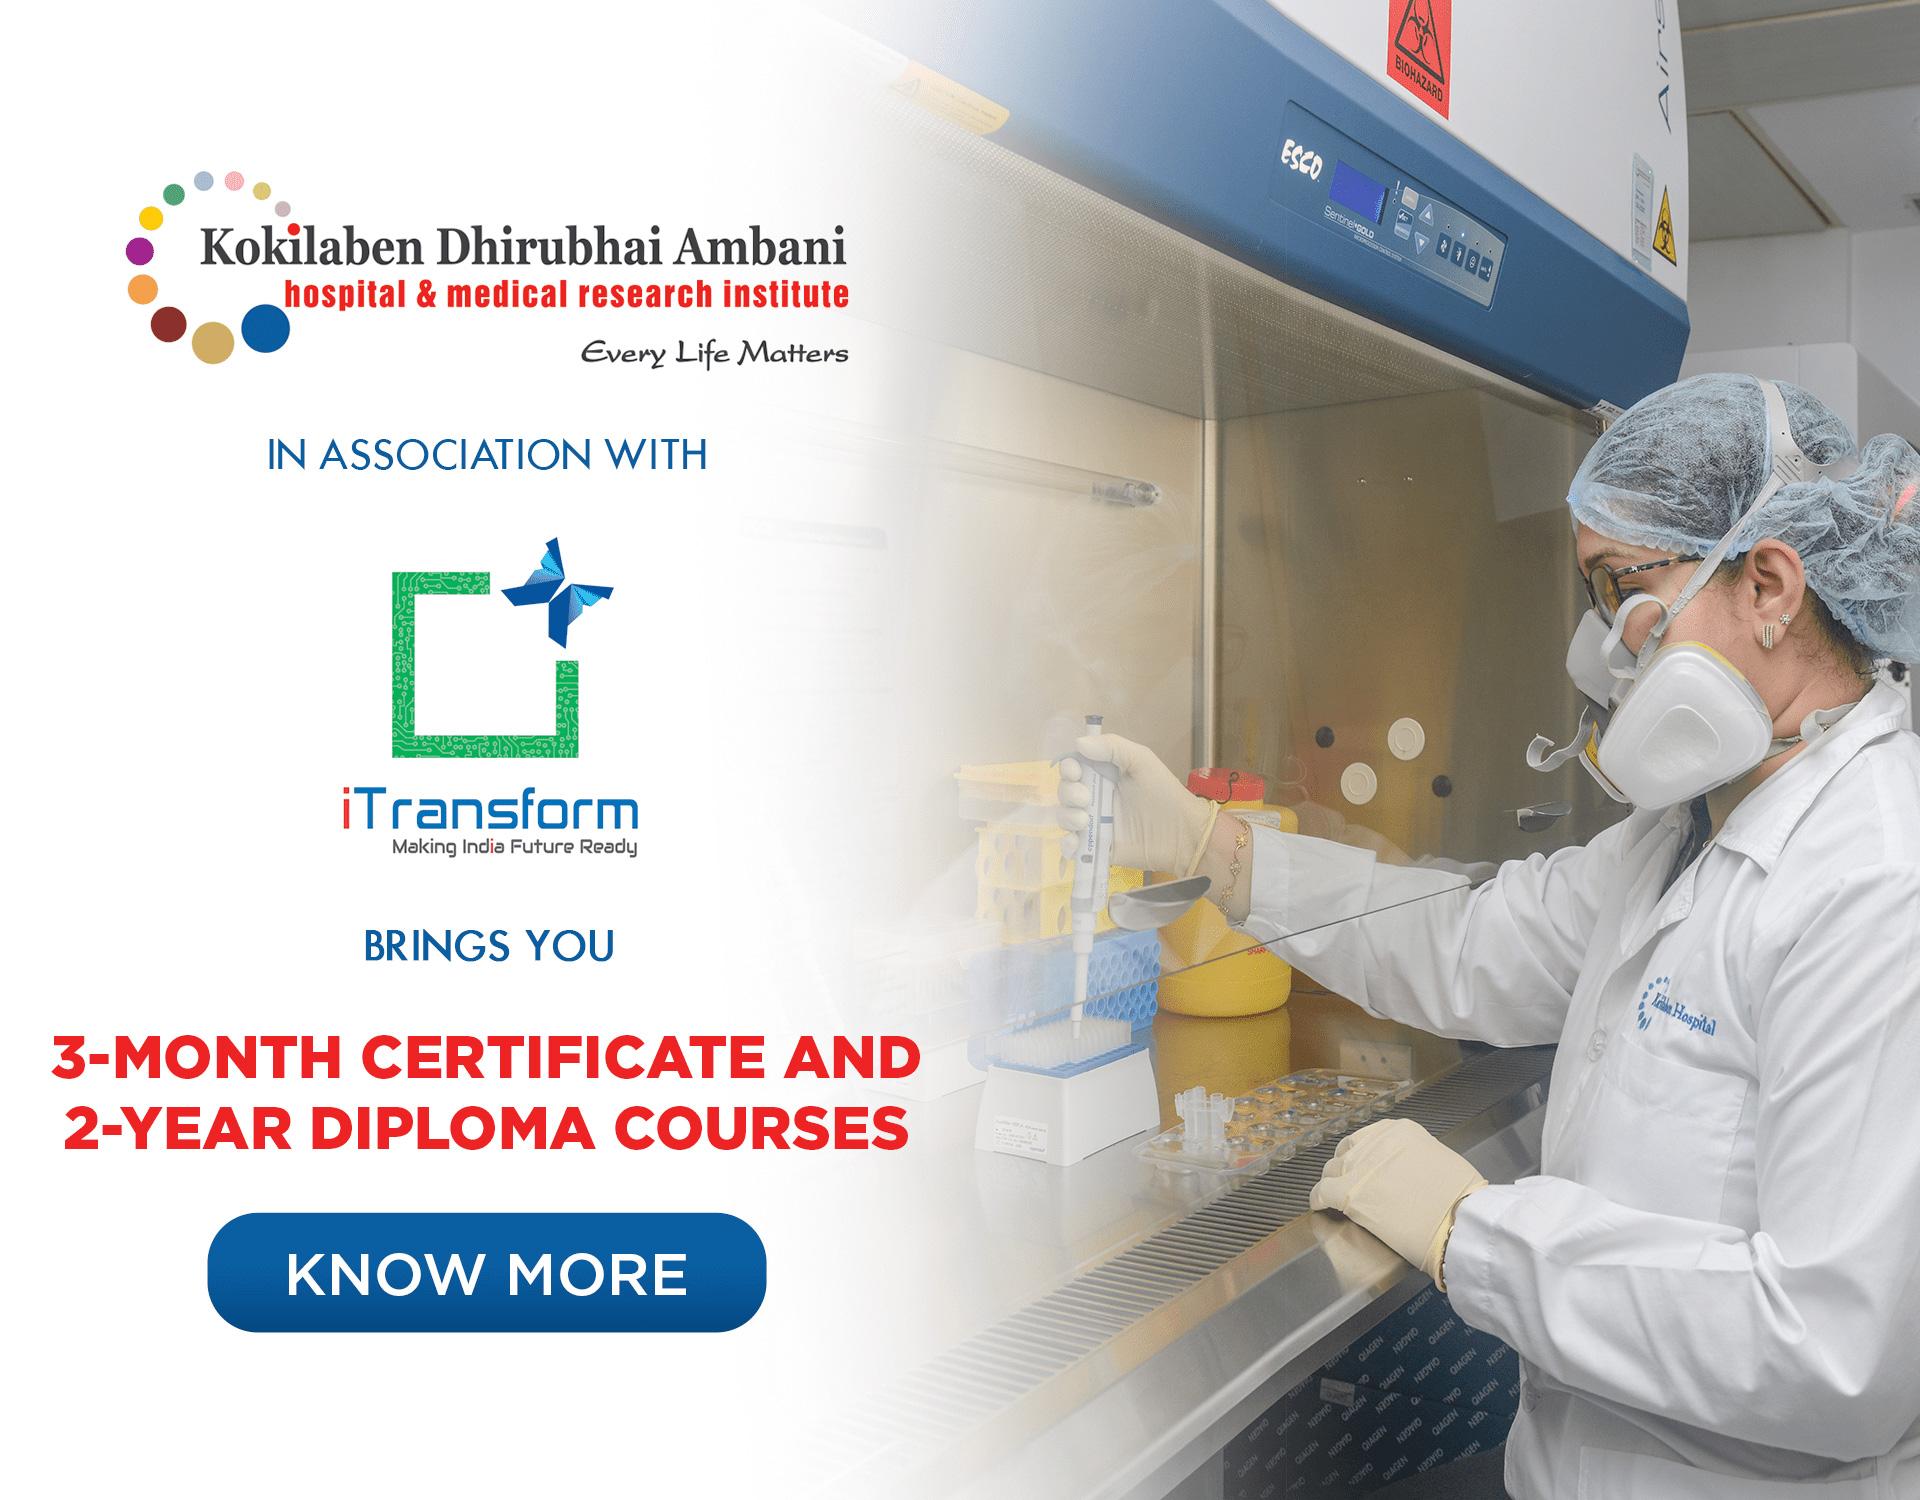 Kokilaben Dhirubhai Ambani Hospital - 3-Months Certificate And 2-Year Diploma Courses